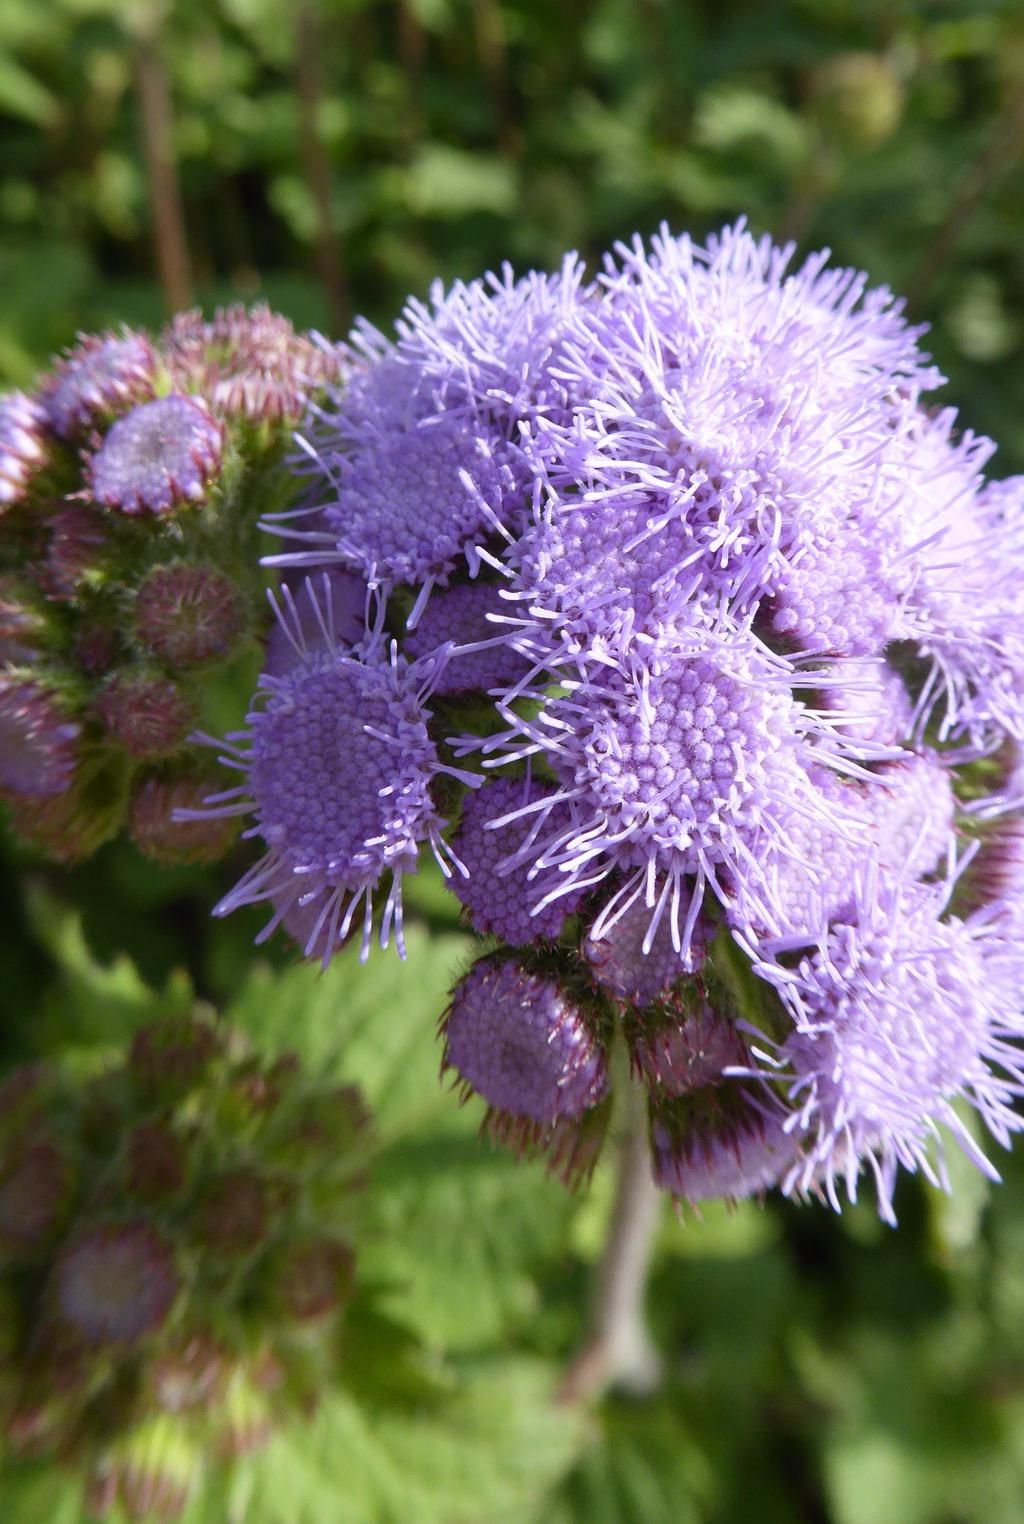 Gardenbeauty on Plants, Plant sale, Perennials